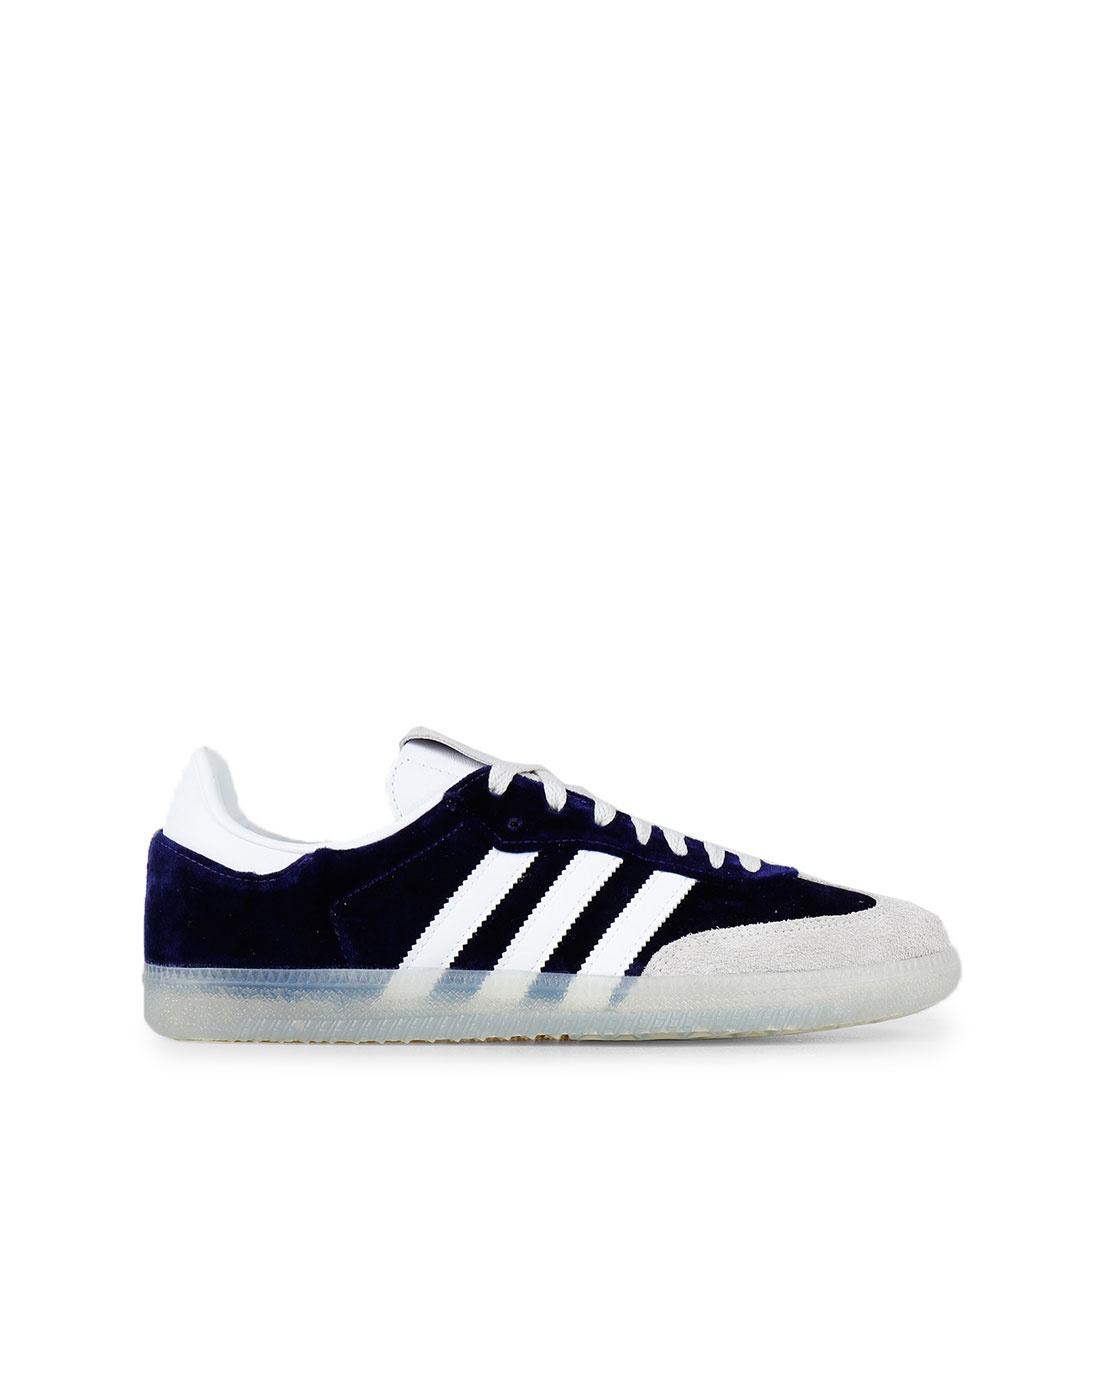 adidas Samba Og Cpurpl Ftwwht Greone DB3011